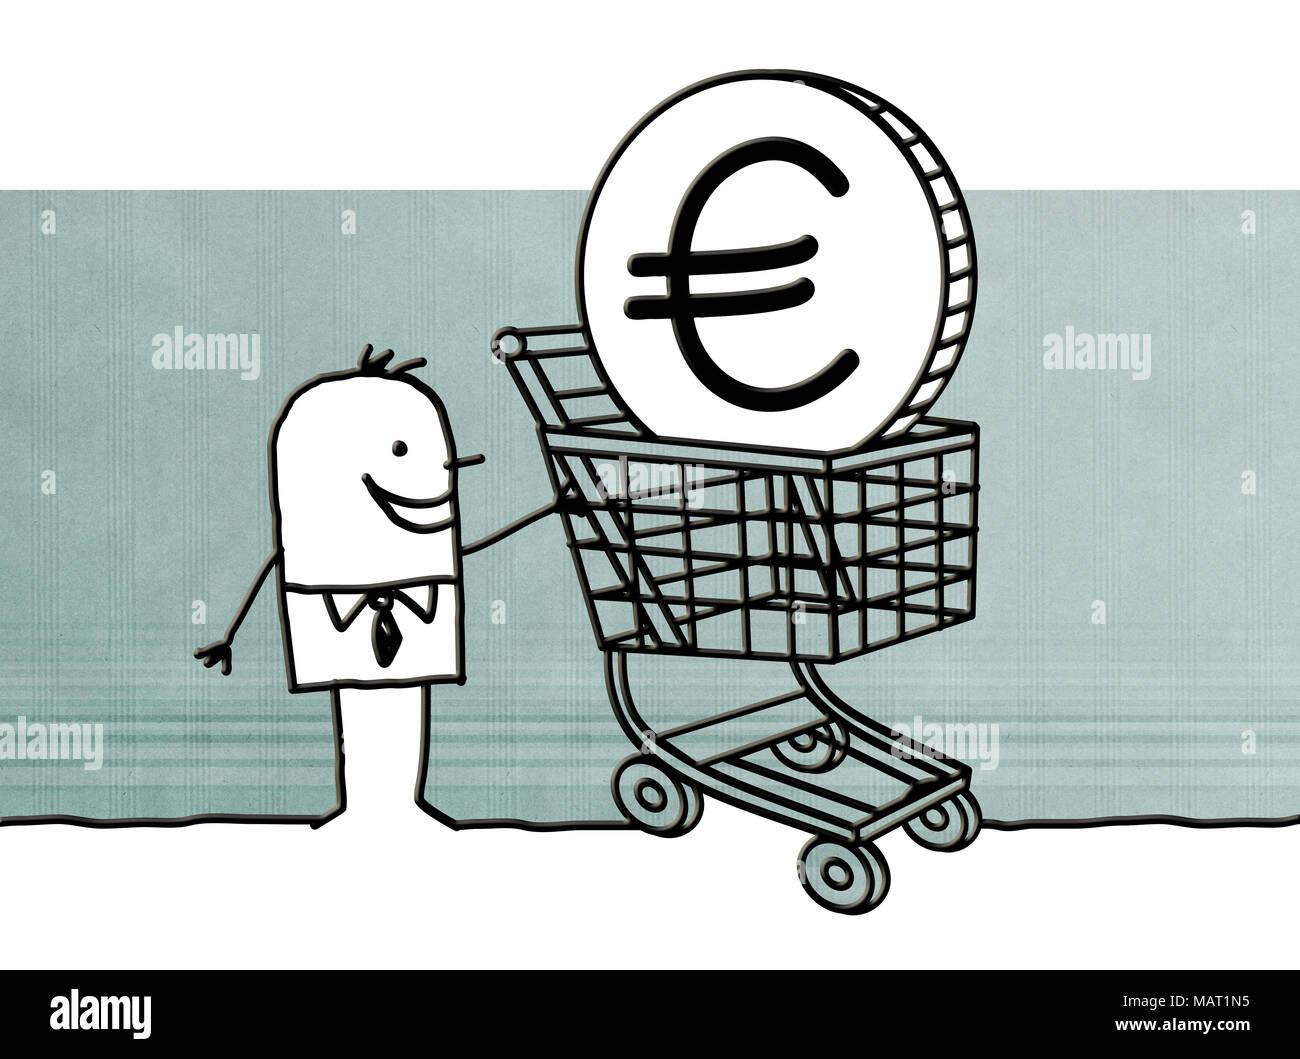 Cartoon Man With Shopping Cart And Euro Sign Stock Photo 178778465